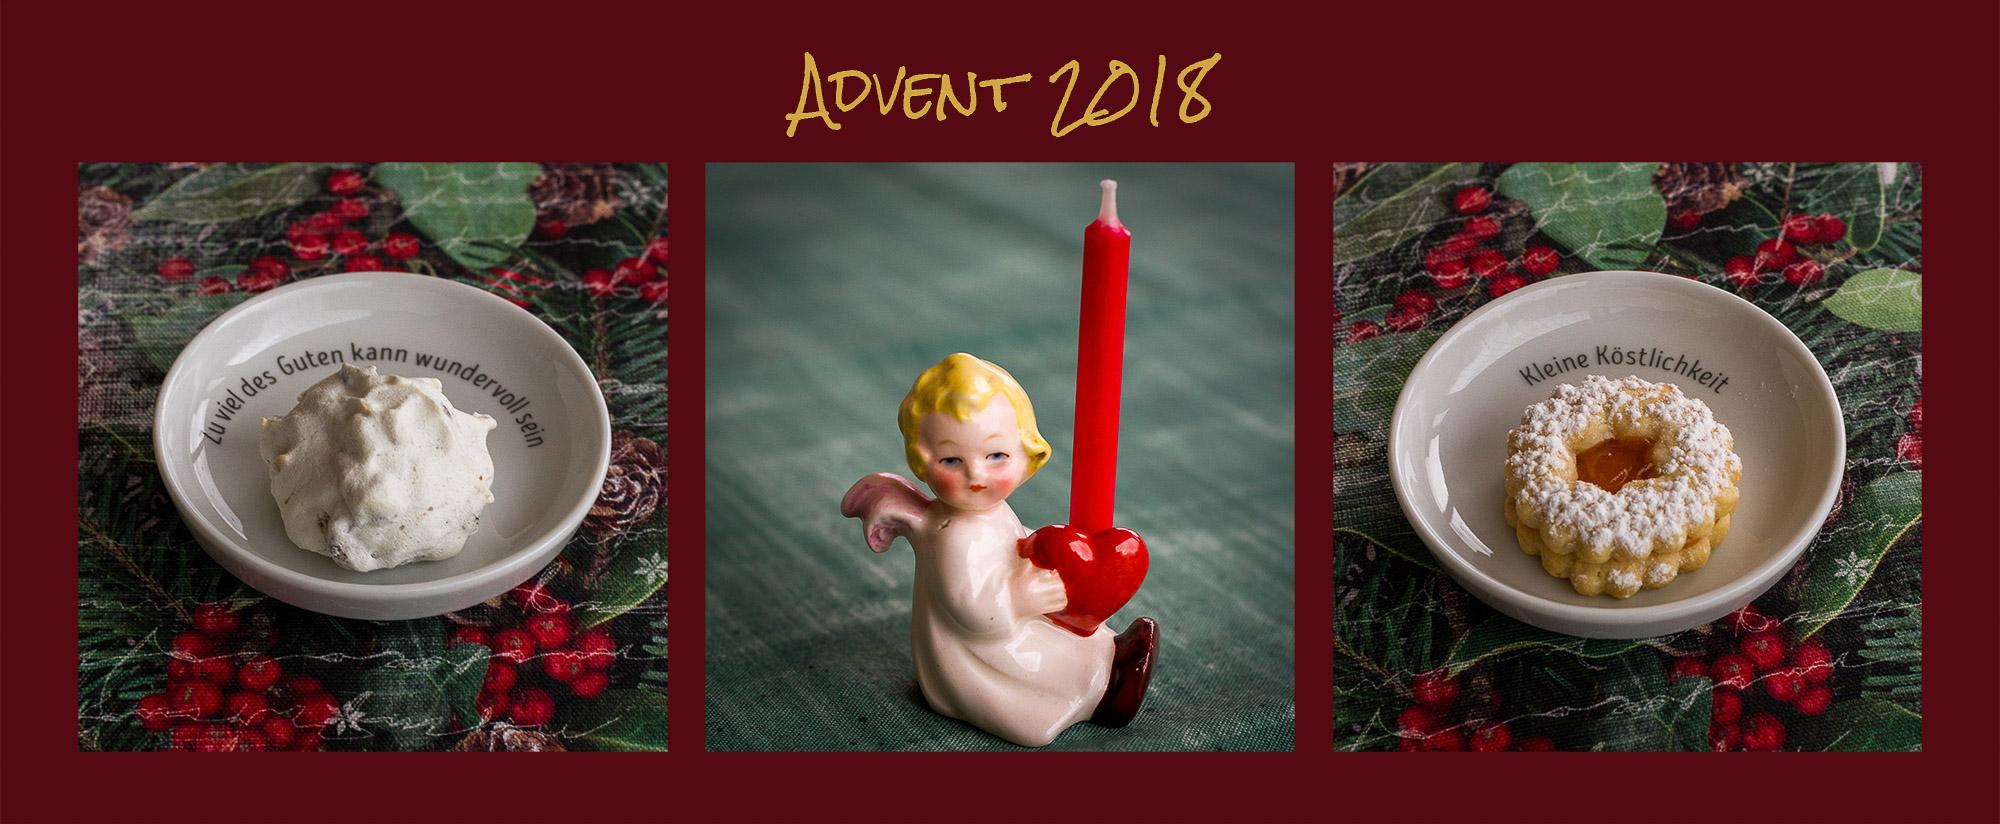 sonjahwolf / Advent